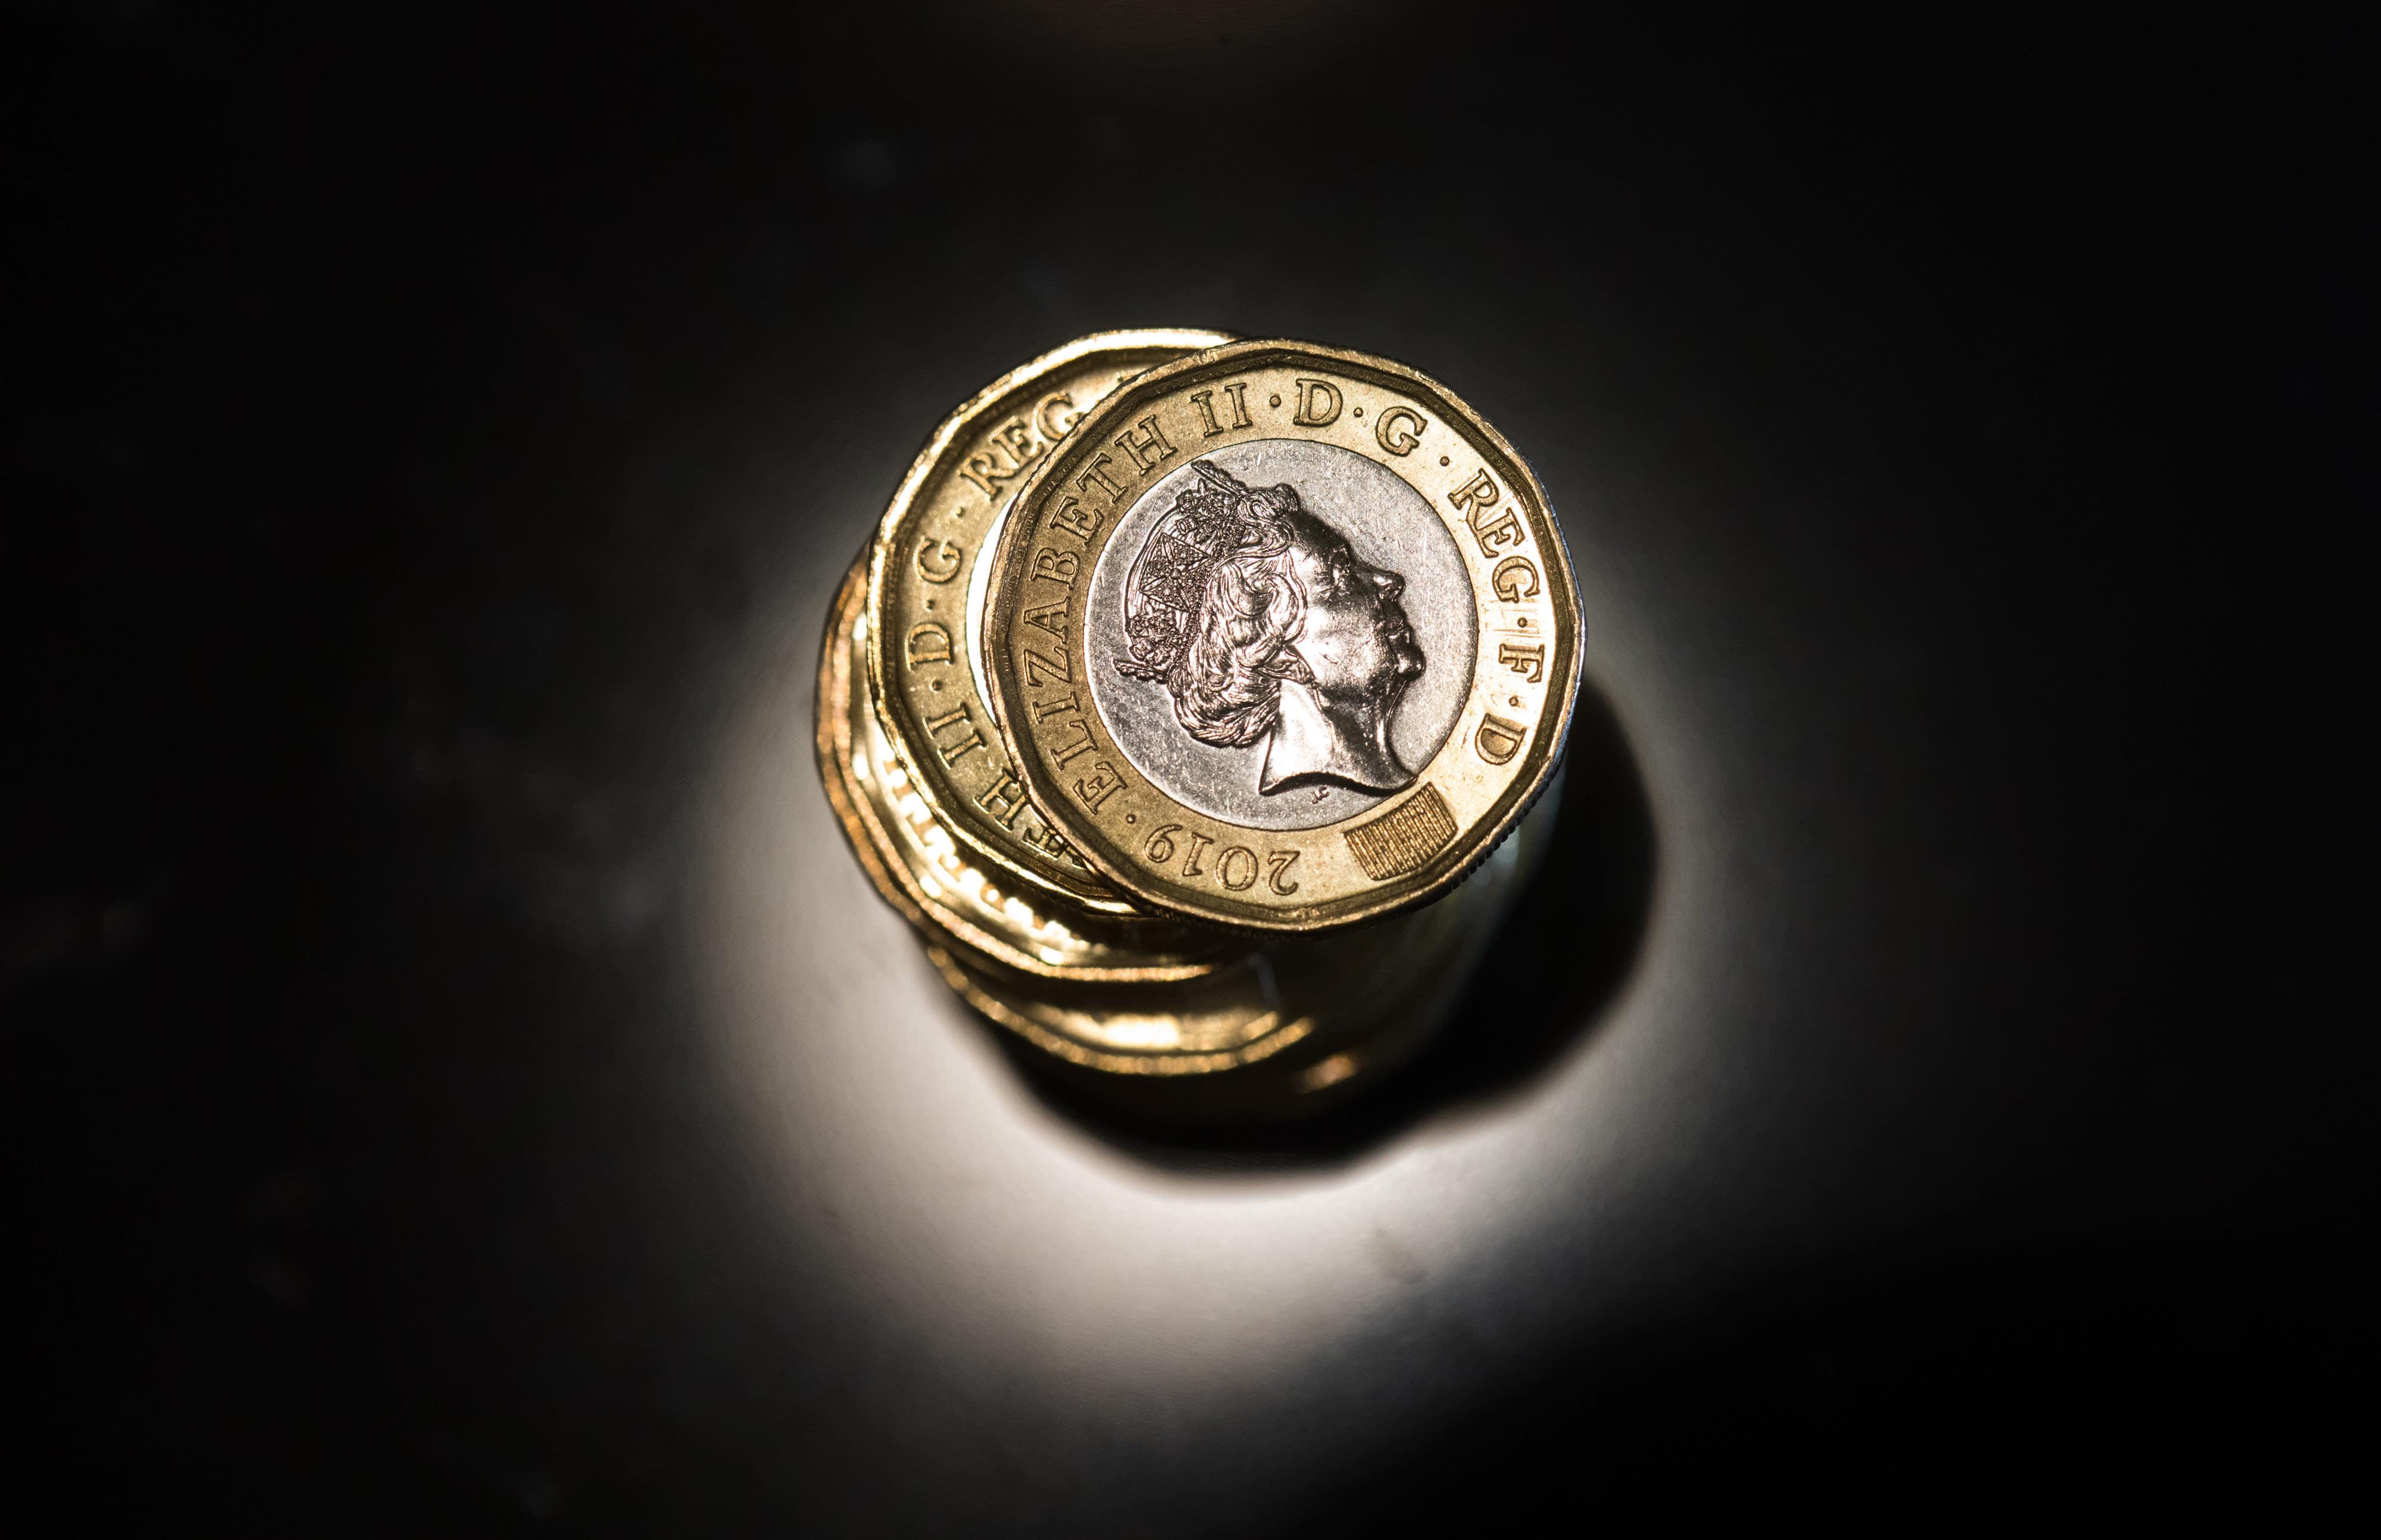 Fairstone cuts £1.4m to honour bonuses